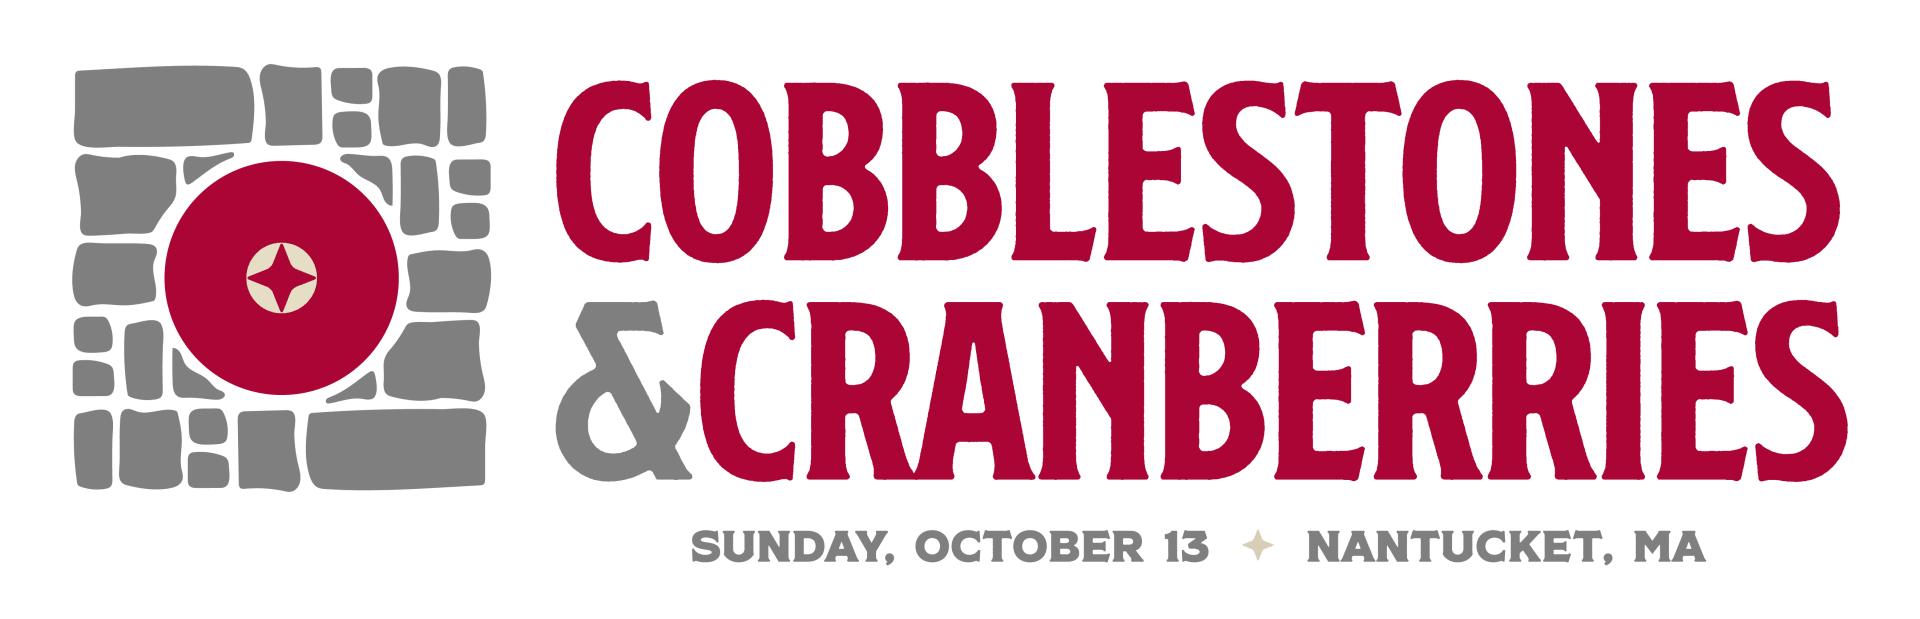 CranberriesCobblestones-Longw500.png